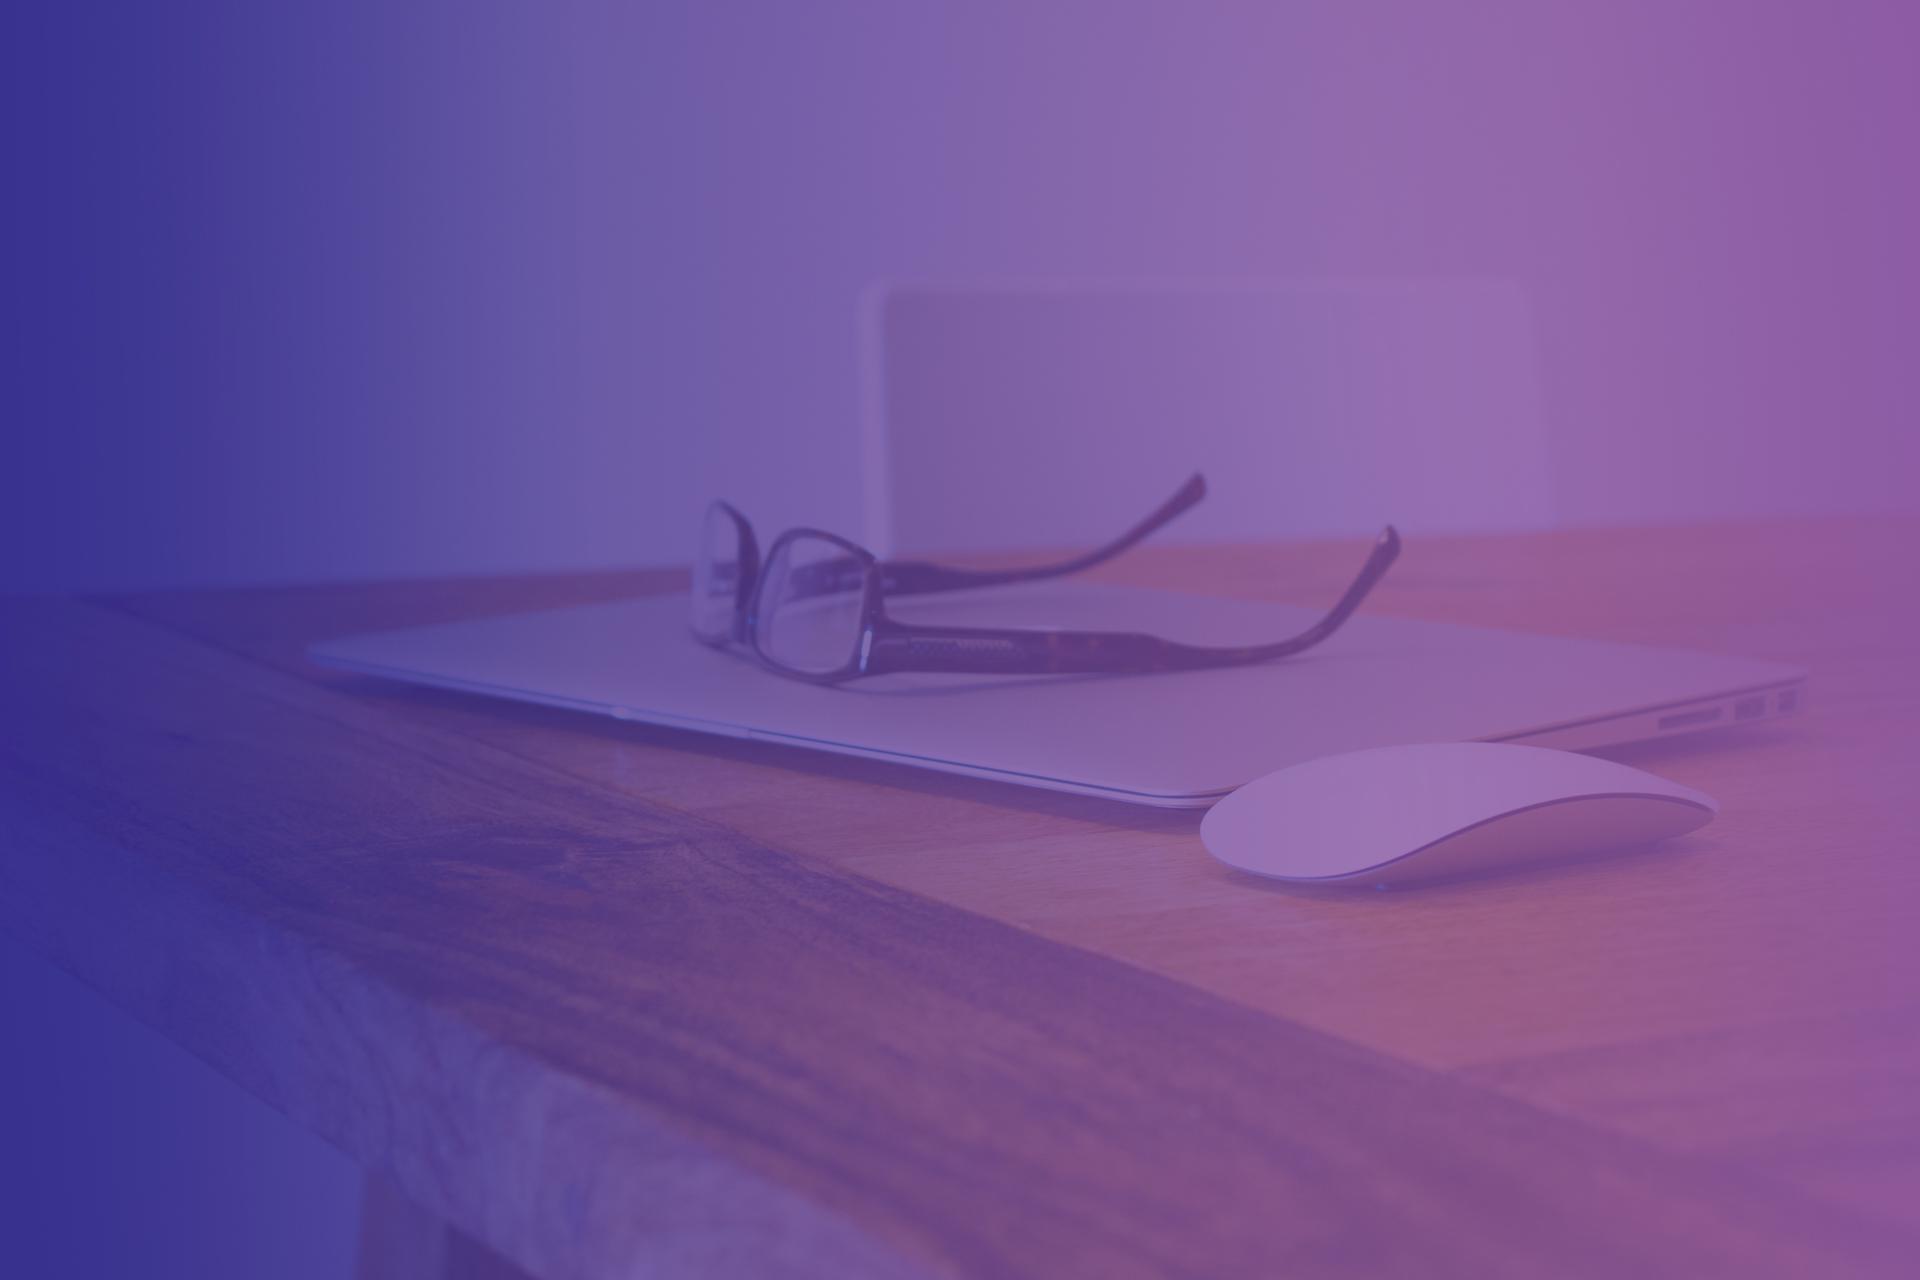 eyeglasses atop closed laptop on blonde wood desk